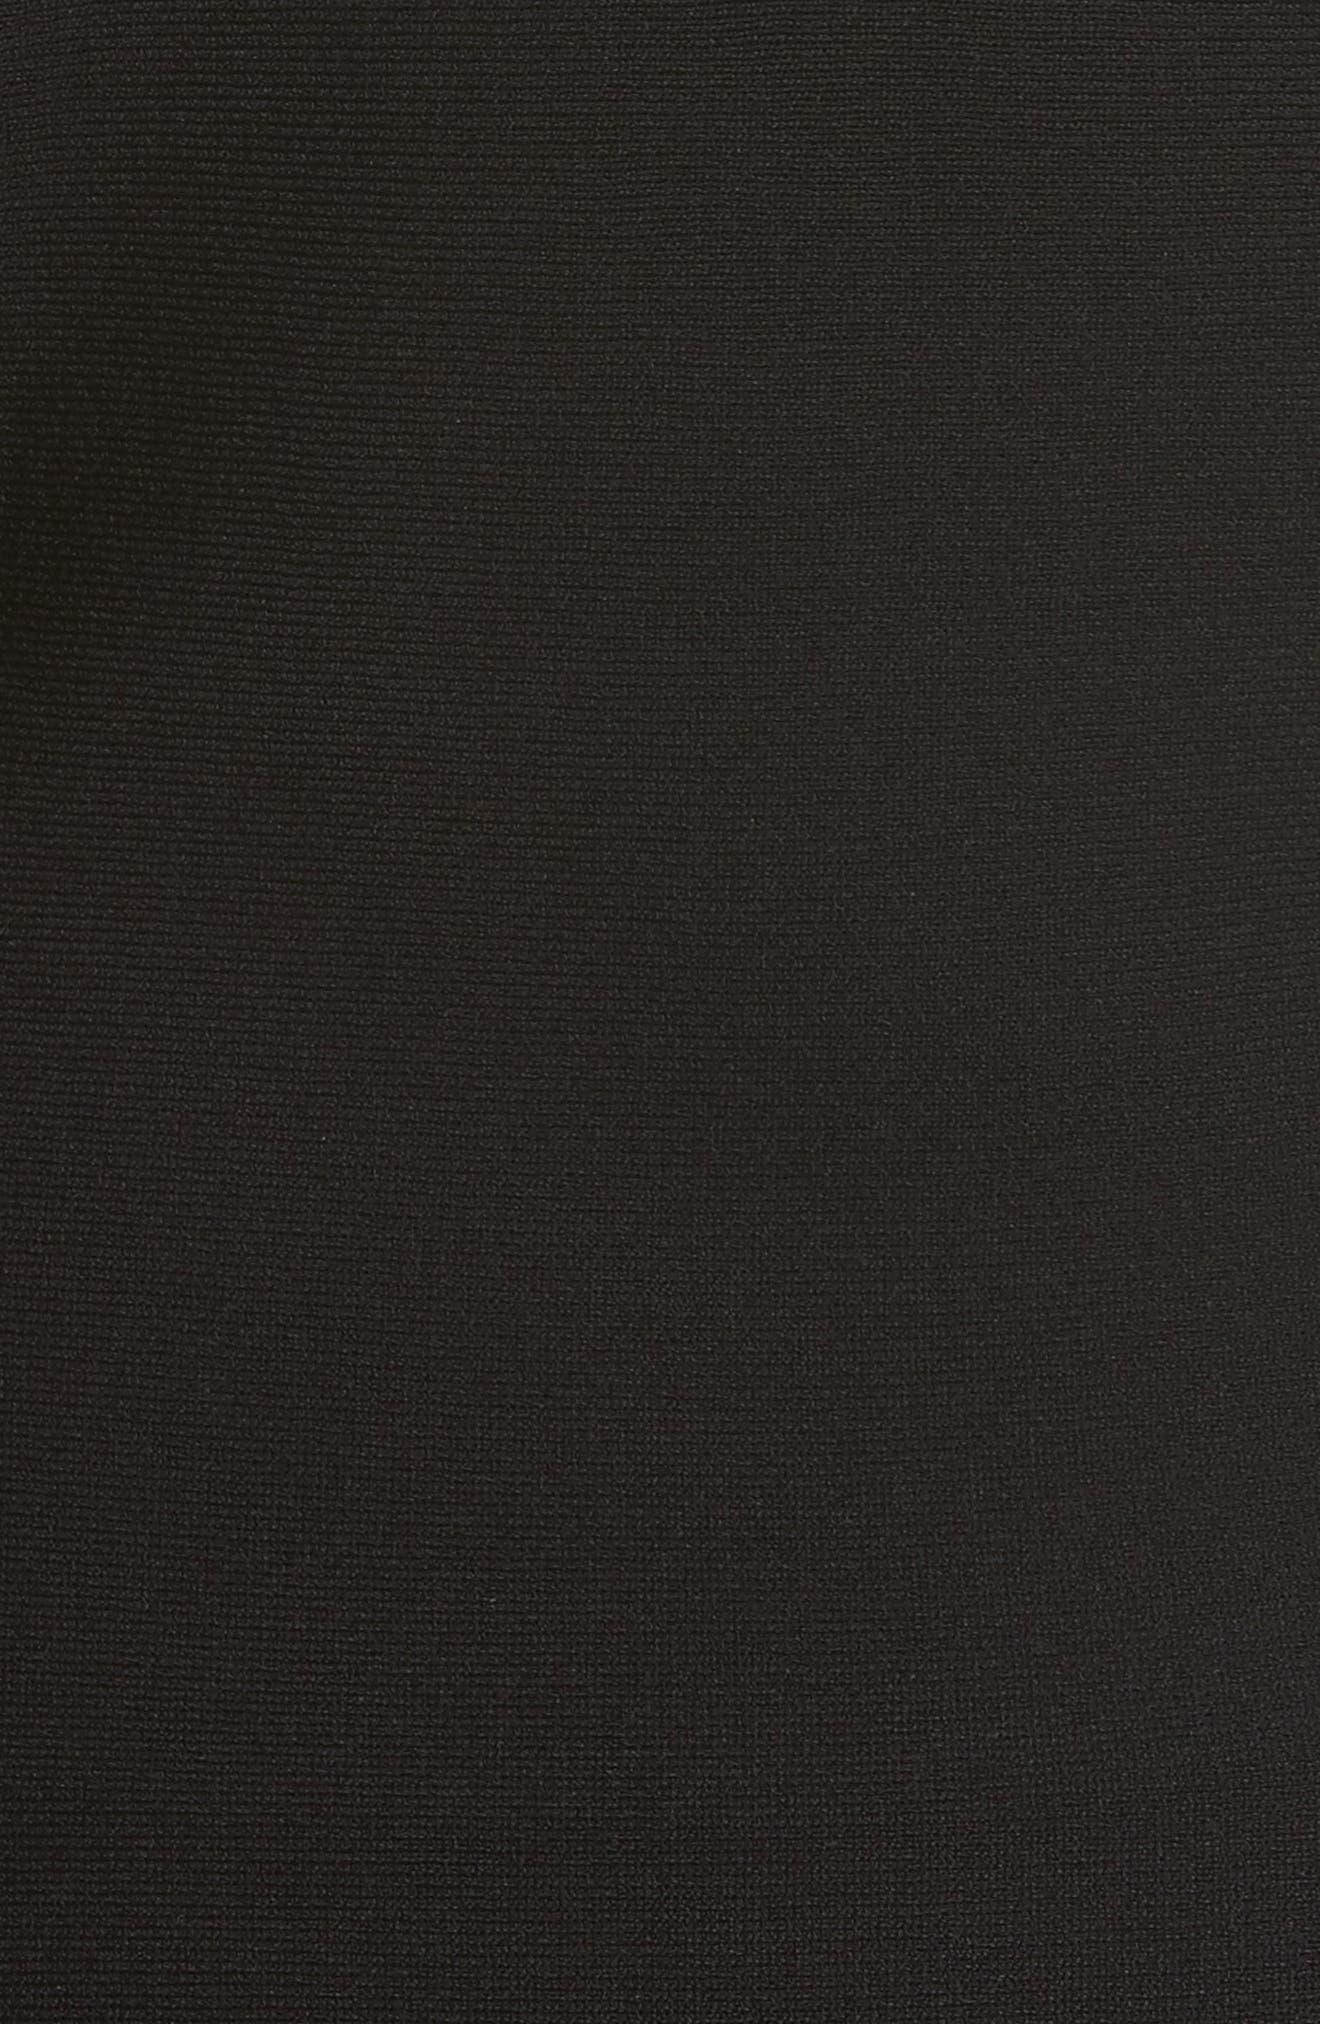 Cutout Detail Sheath Dress,                             Alternate thumbnail 5, color,                             001